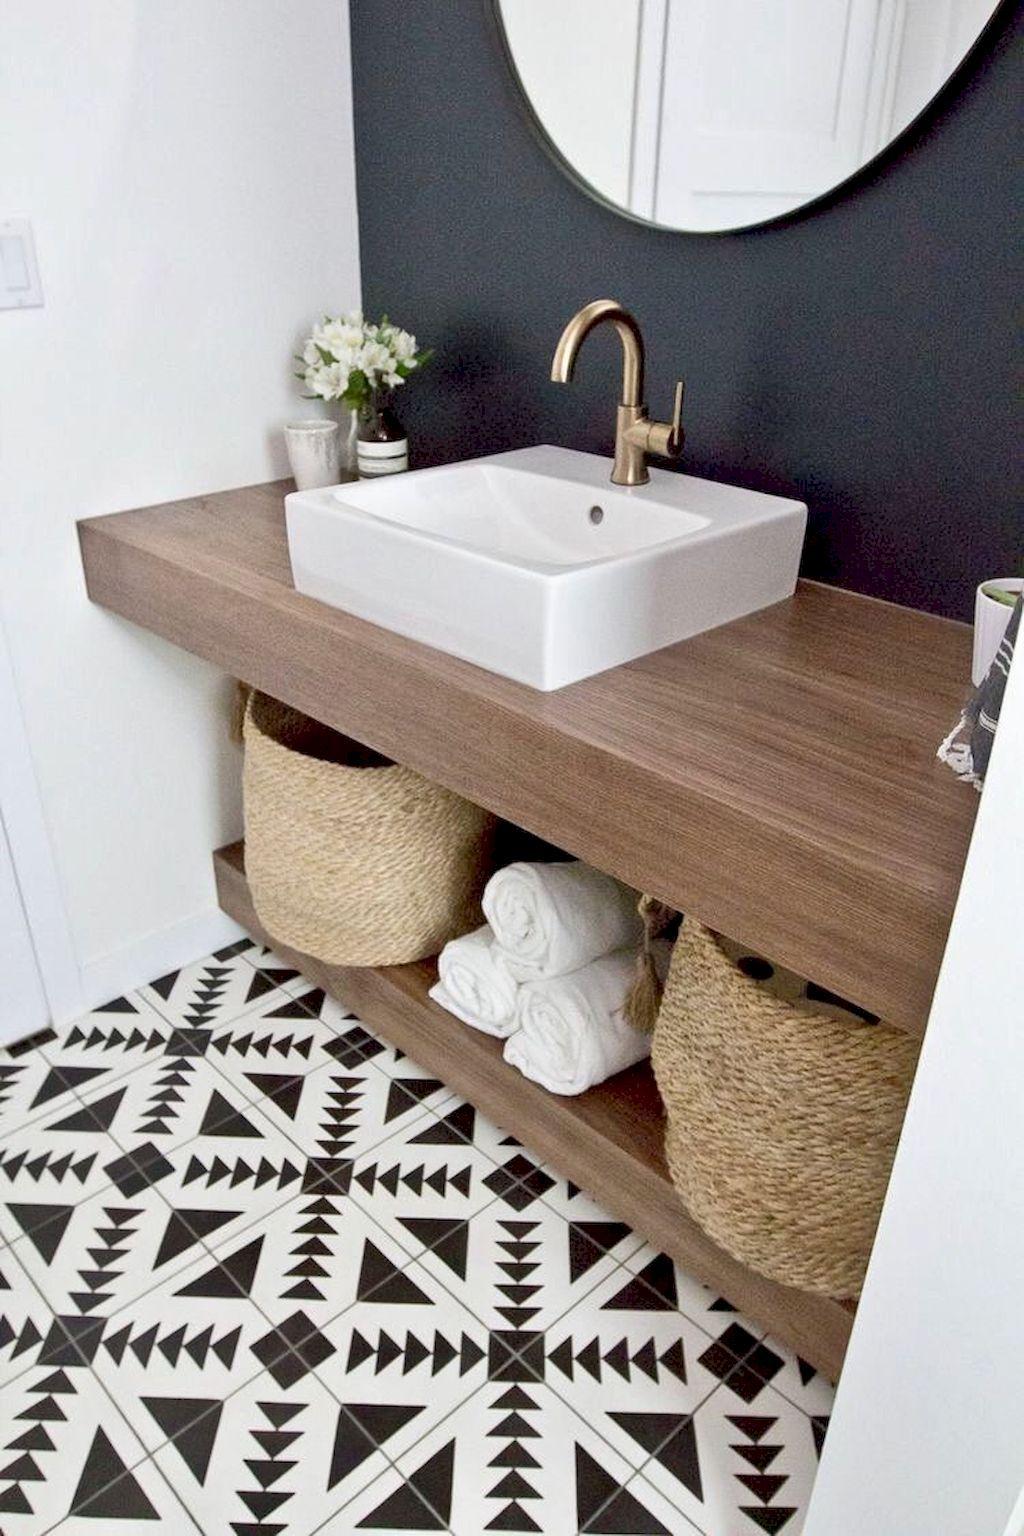 36-Inspiring-Farmhouse-Bathroom-Remodel-Ideas.jpg